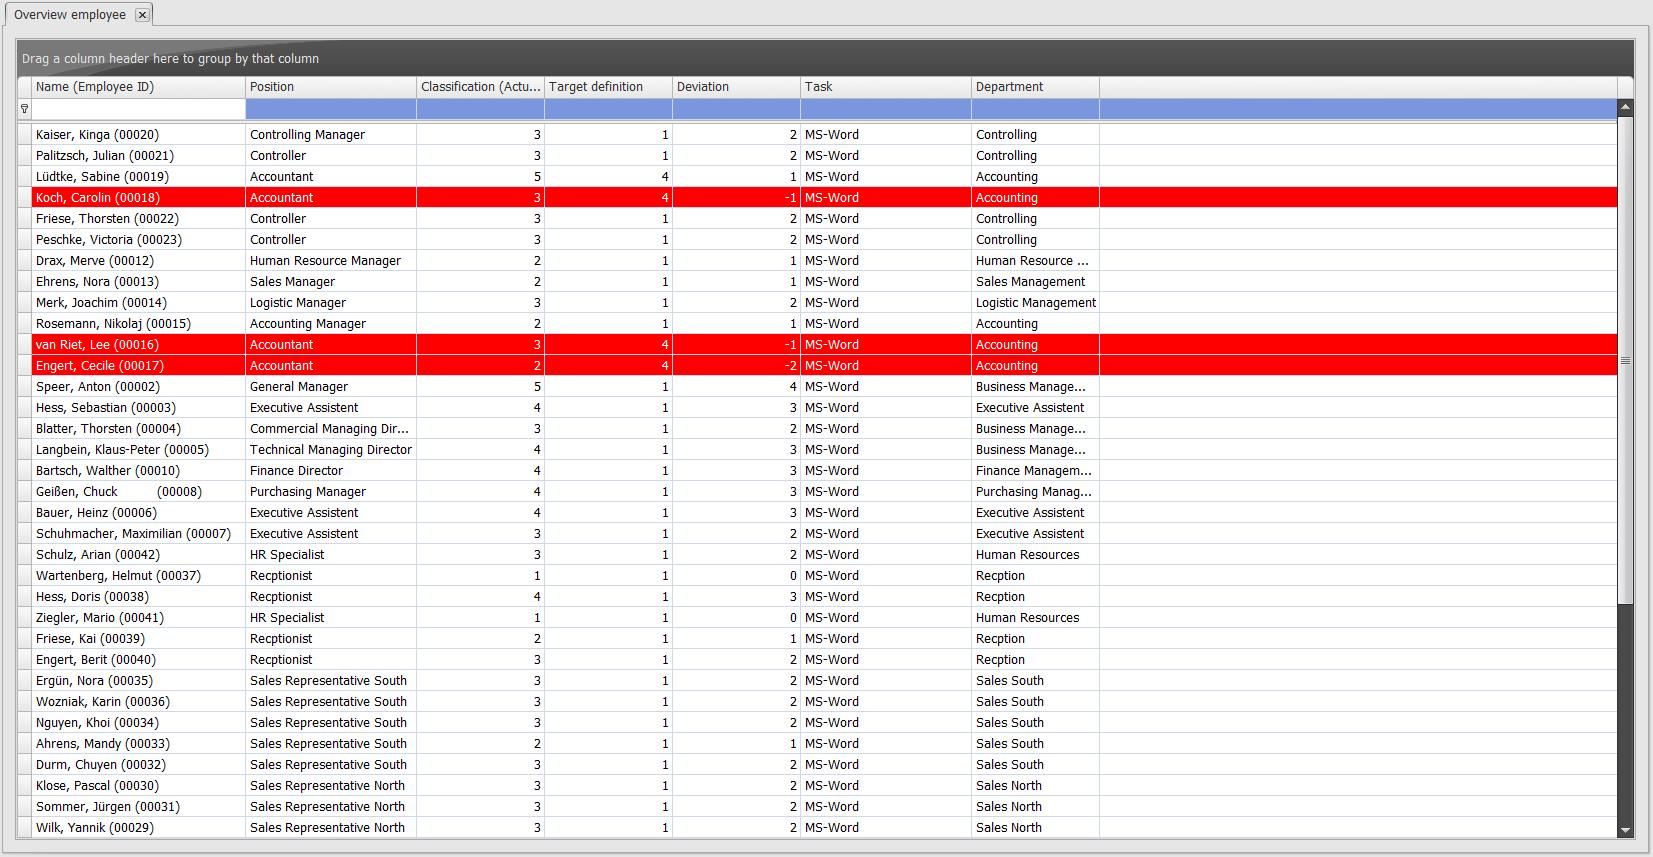 Employee Target/Actual